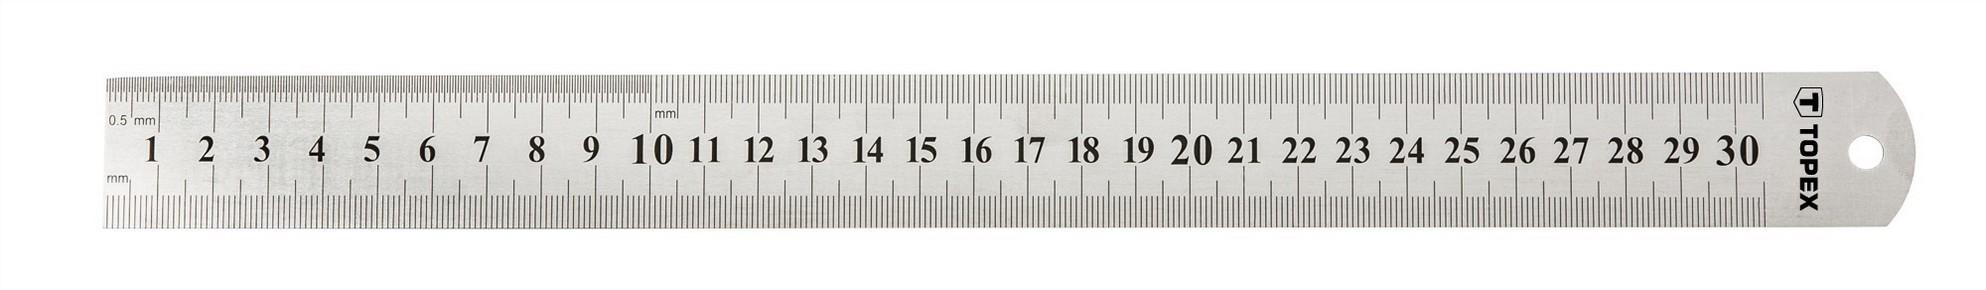 Acélvonalzó 300 mm rozsdamentes | TOPEX 31C030